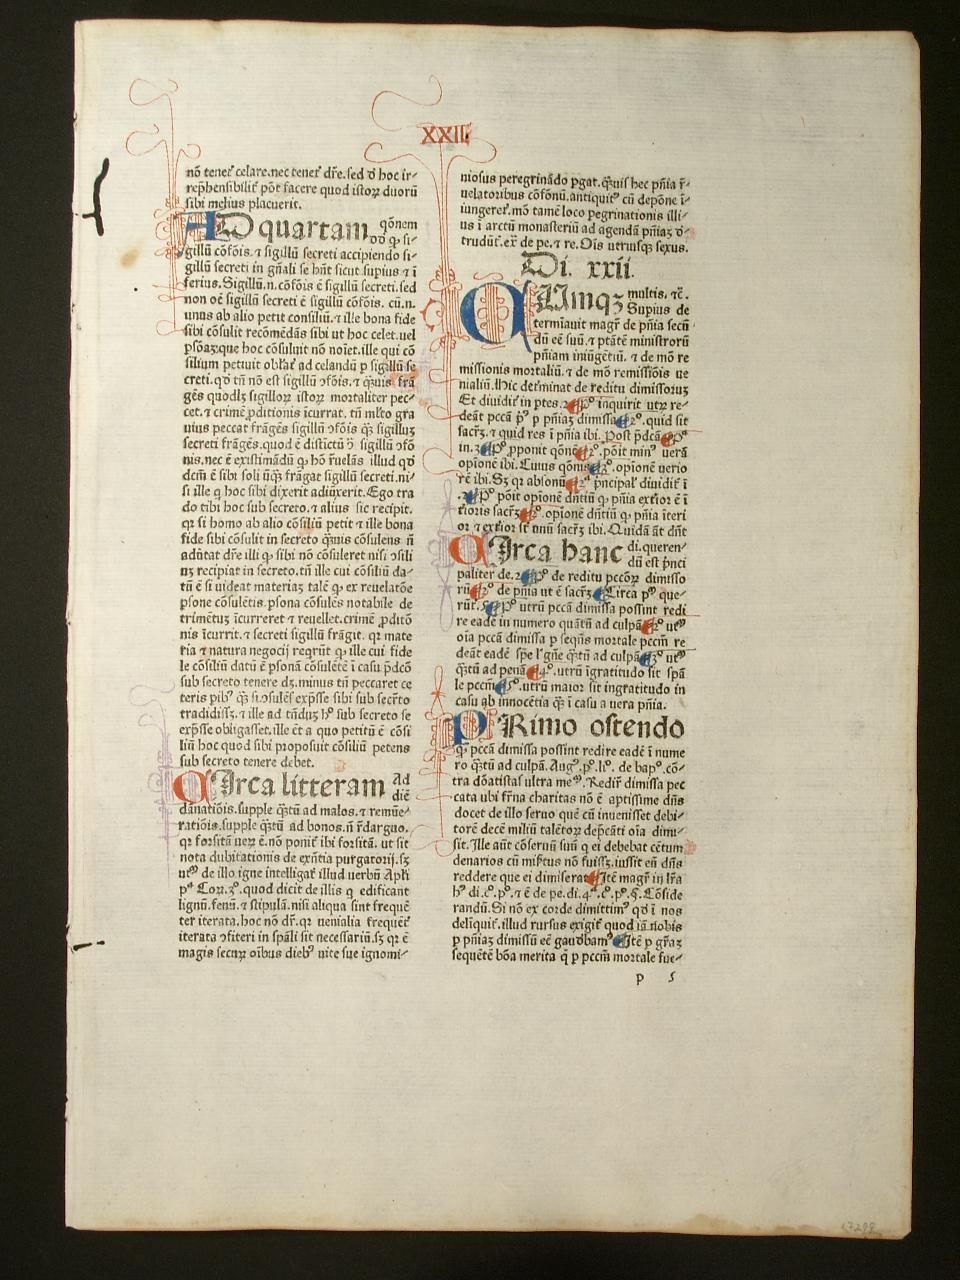 Super IV. sententiarum. Di. XXII. (GWM 22509,: Richardus de Mediavilla: